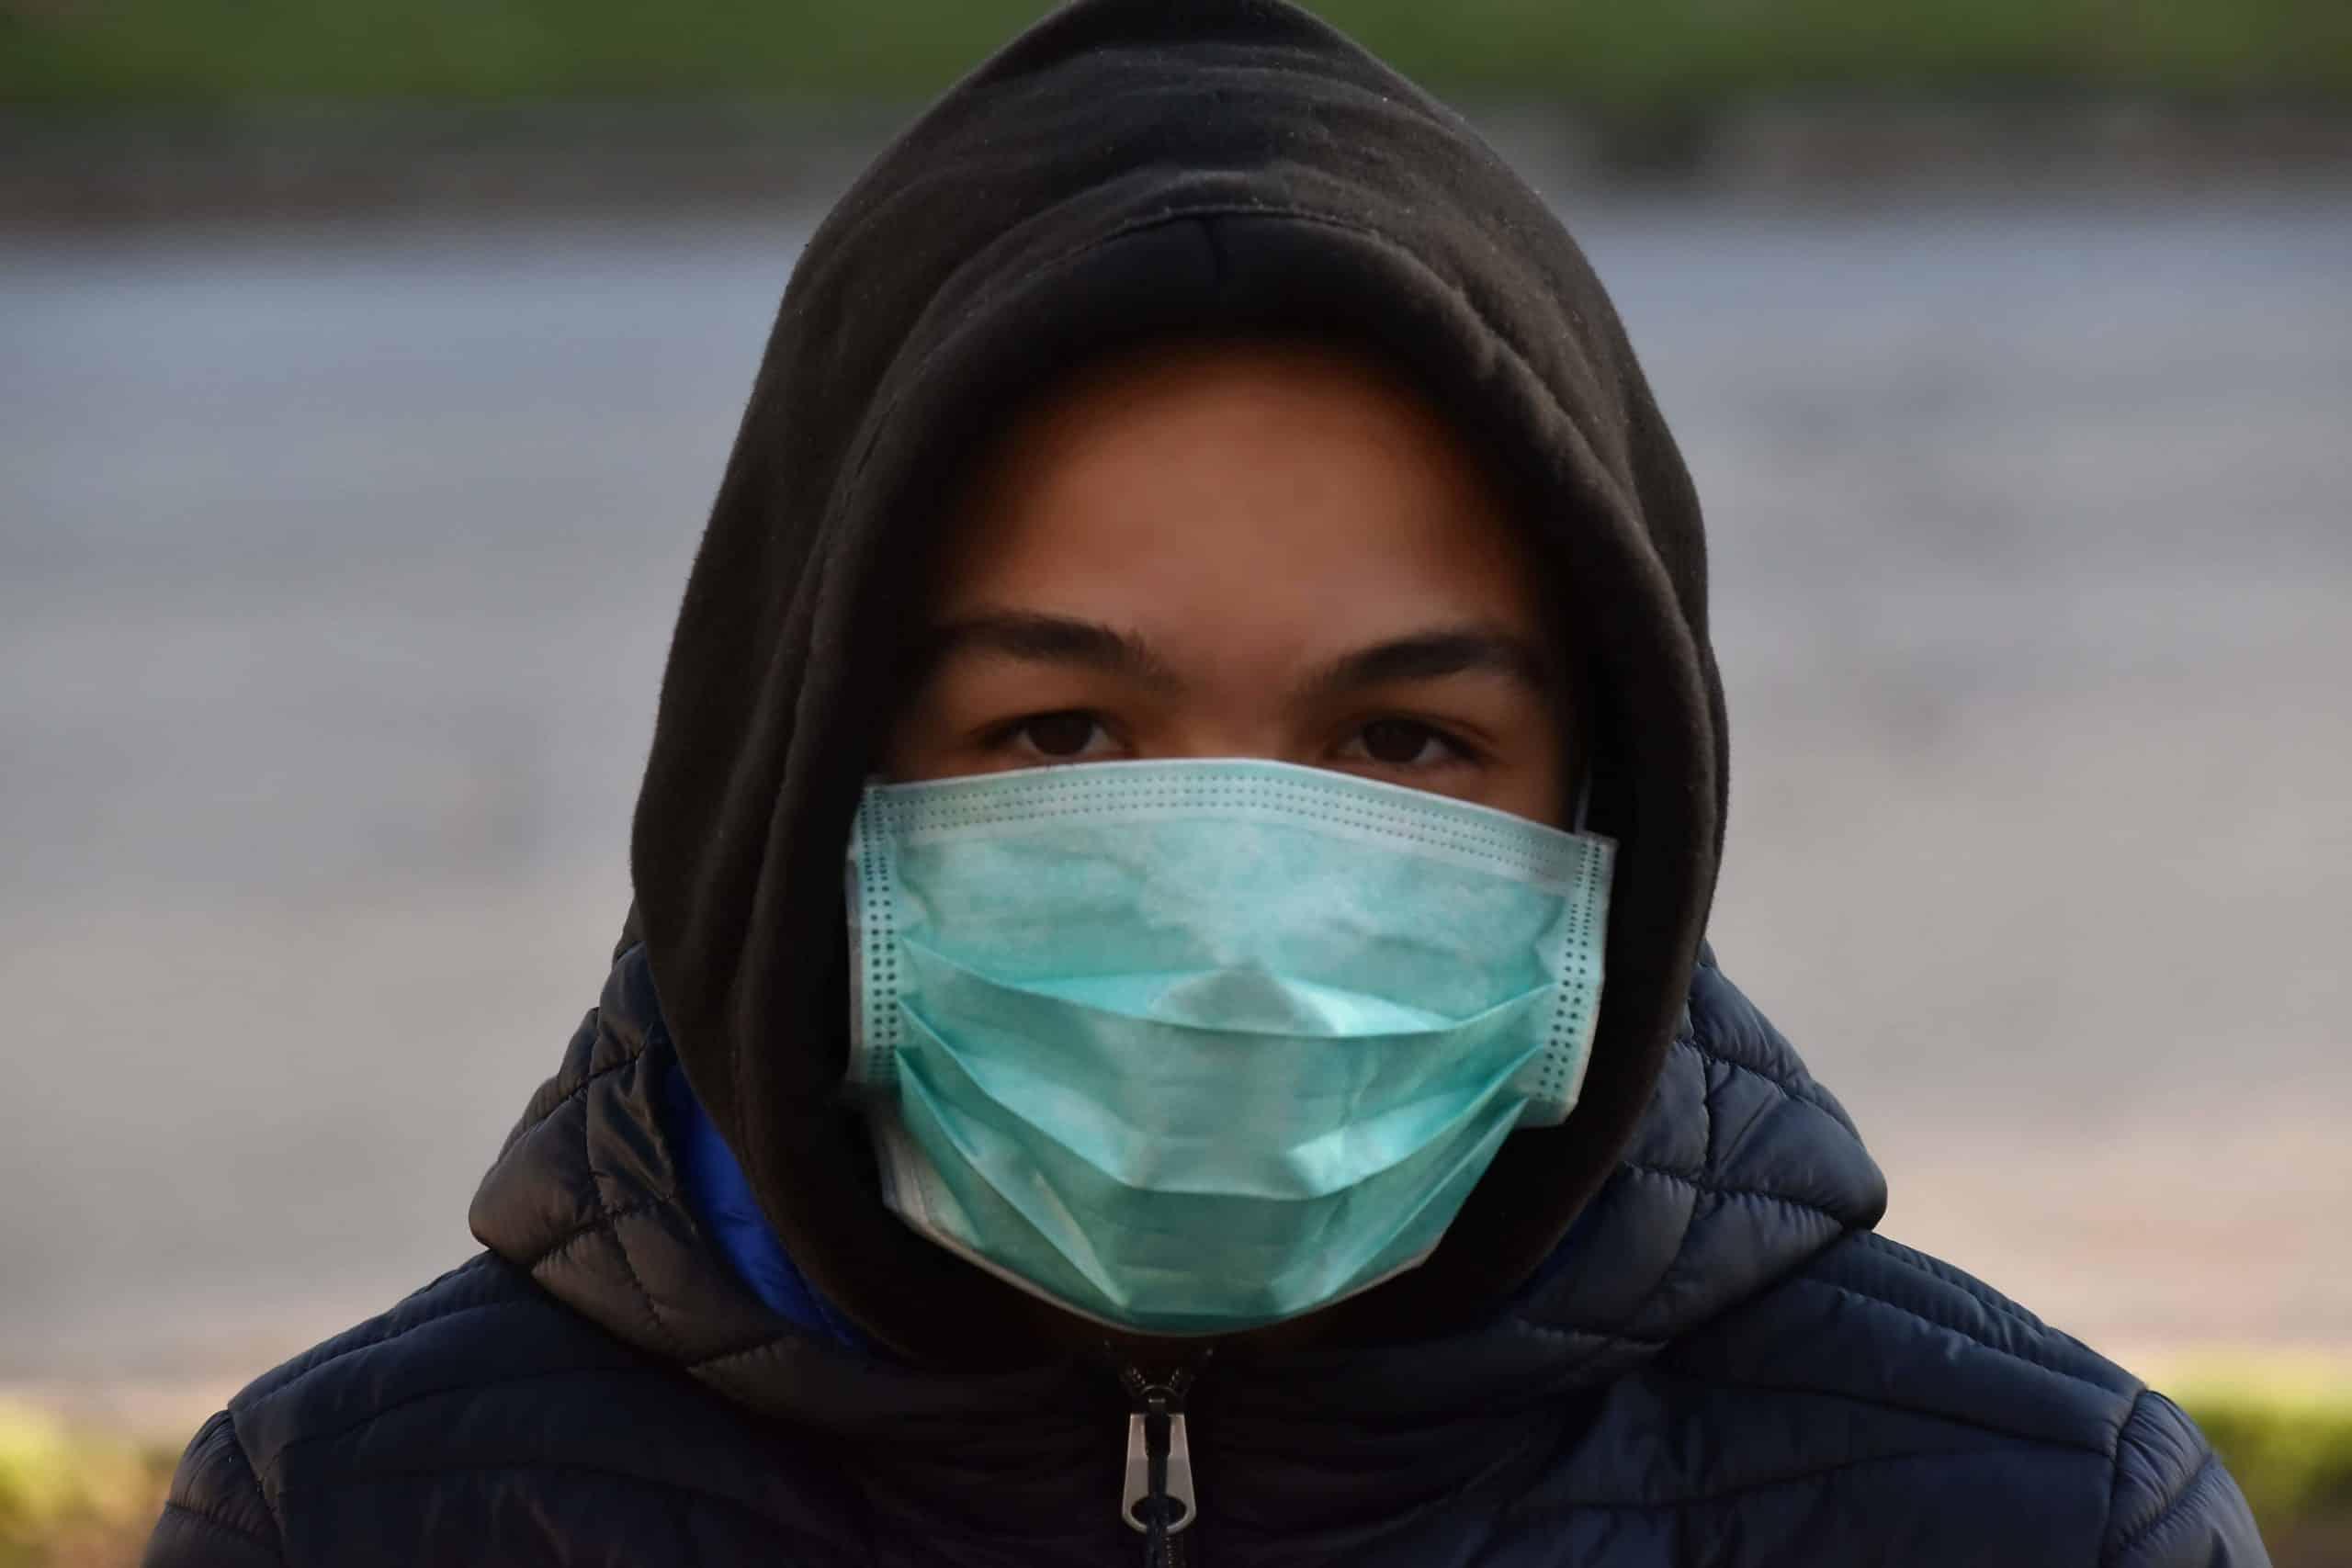 Xenophobic Ideas Spread Along with the Novel Coronavirus